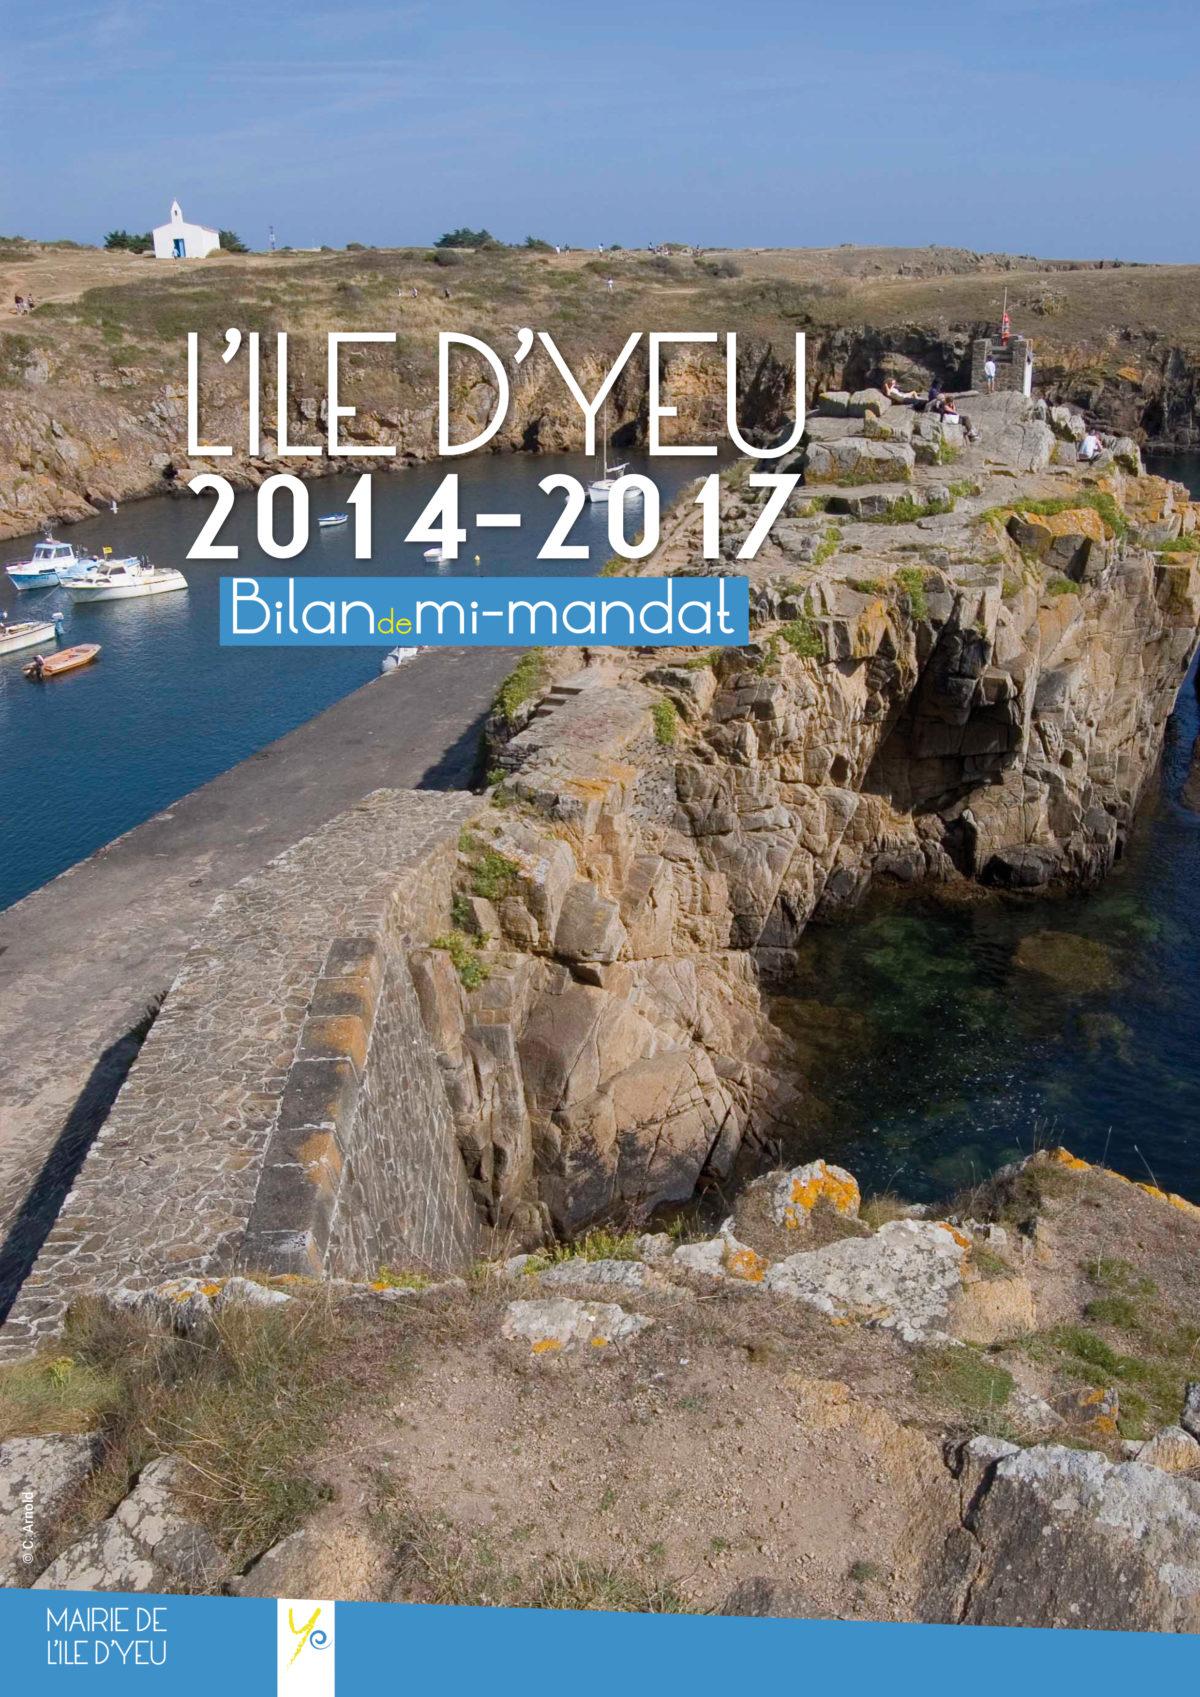 Bulletin mi-mandat - mairie - L'Ile d'Yeu